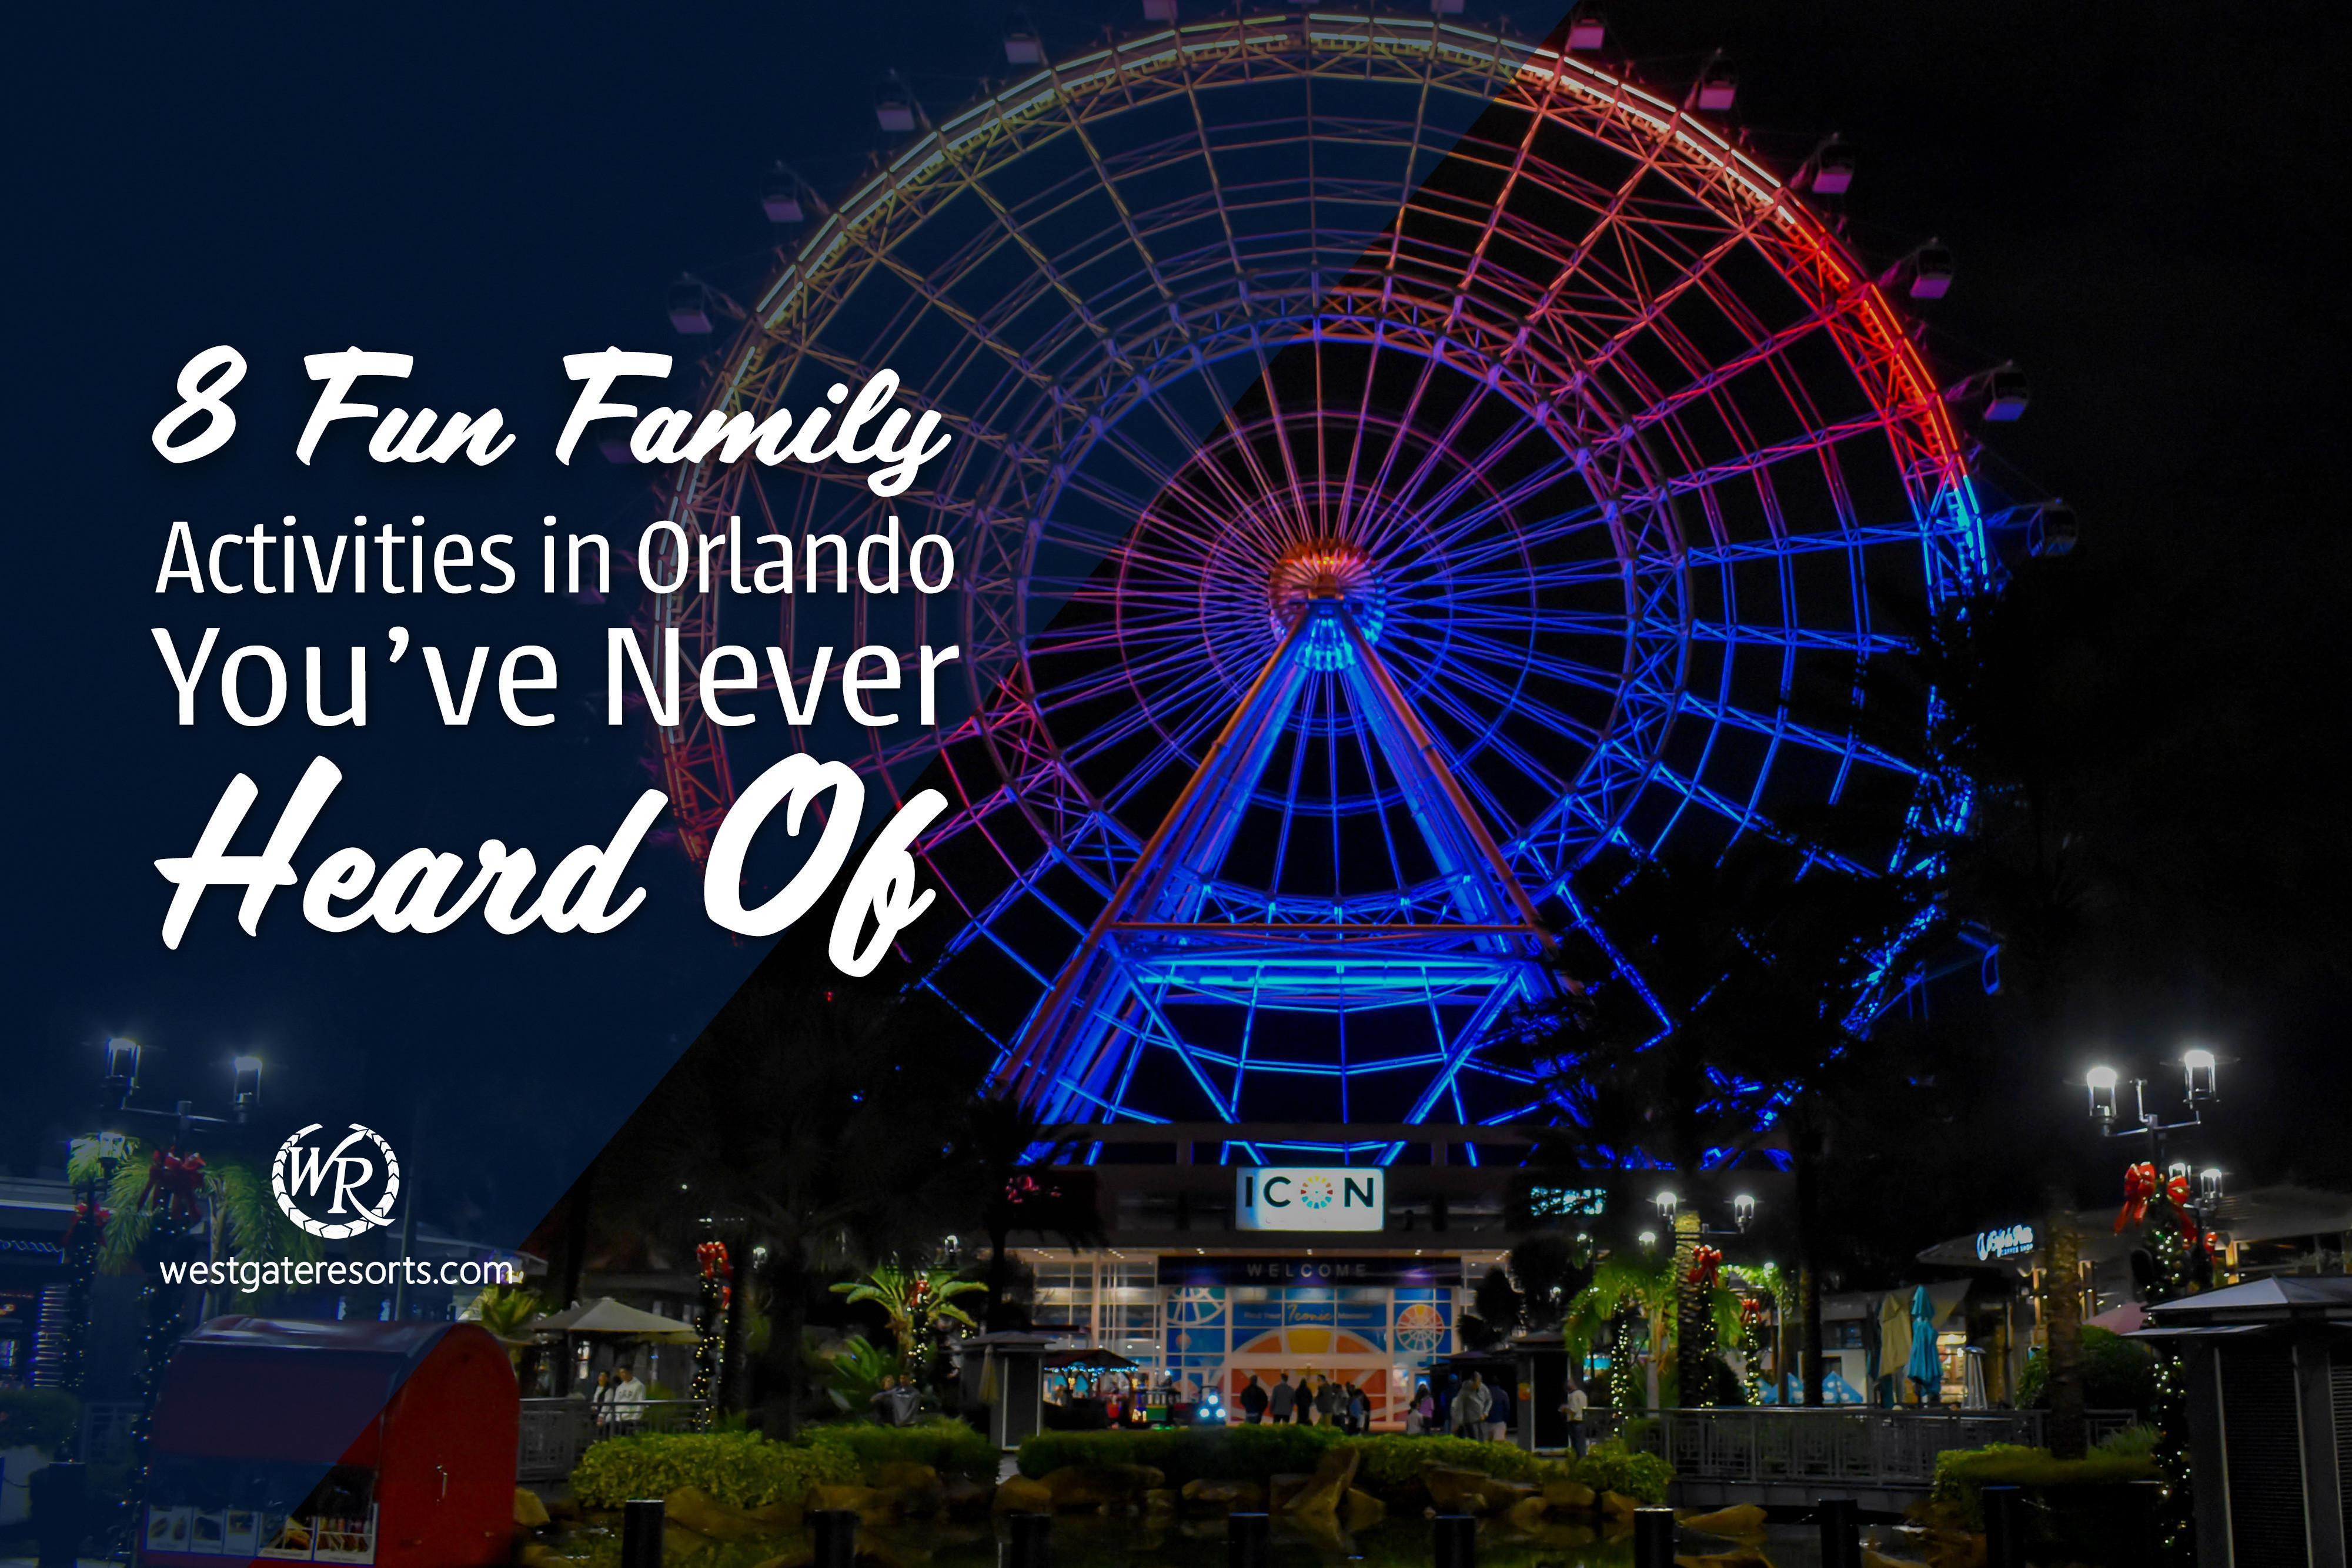 8 Fun Family Activities in Orlando You've Never Heard Of